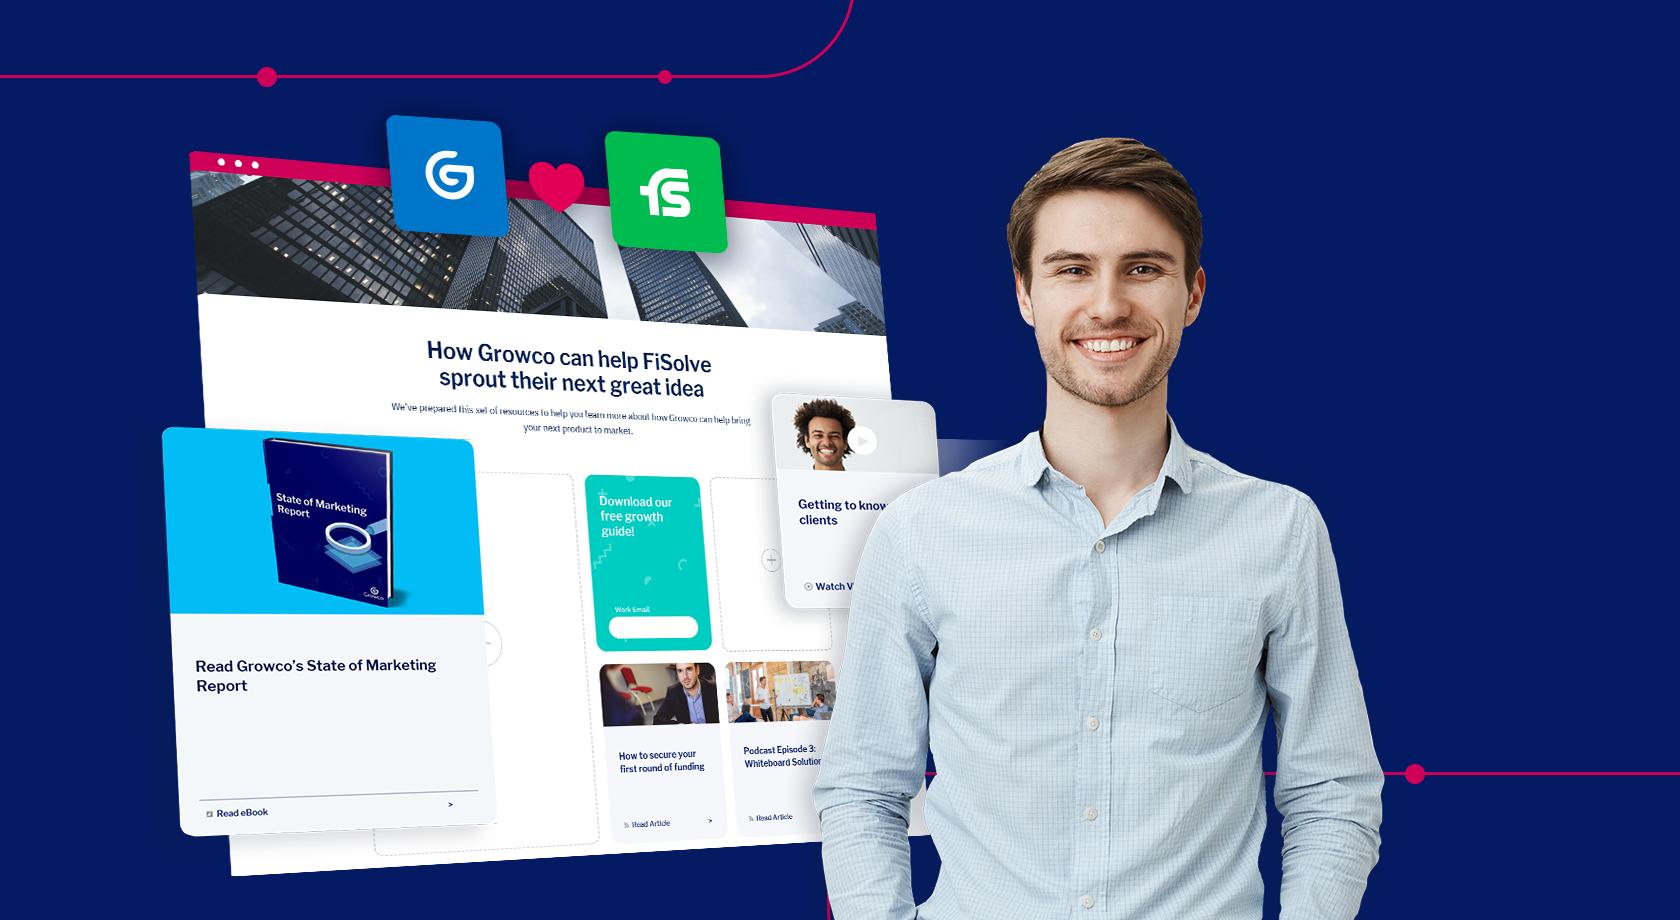 Man in business attire standing in front of Uberflip marketing stream